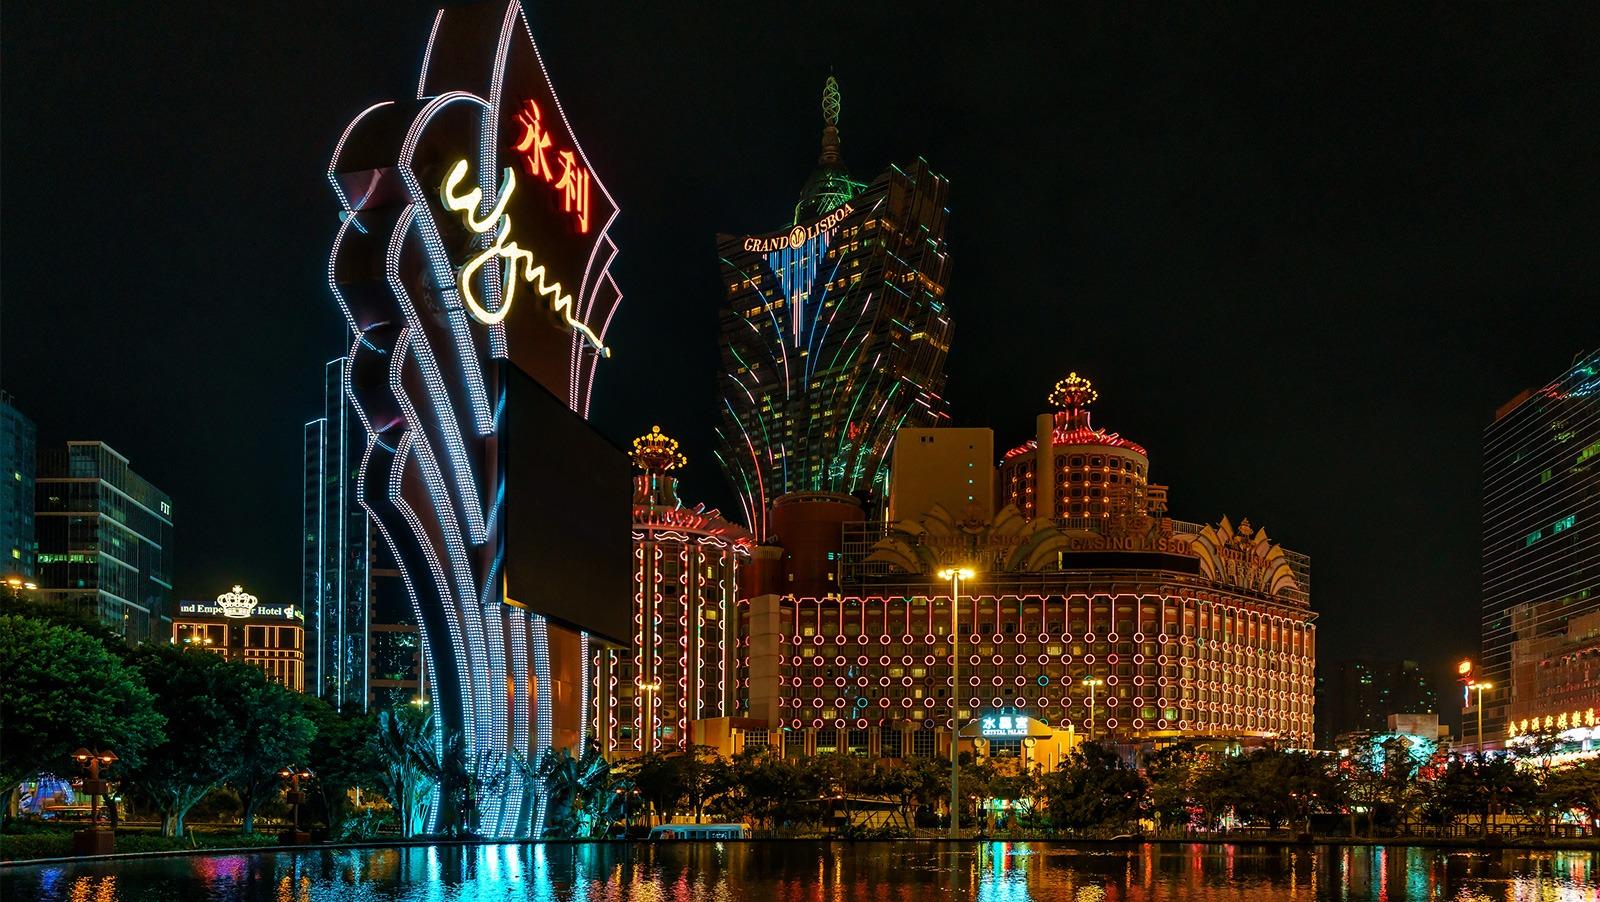 Macau gaming revenue predicted to continue drop through 2019 end